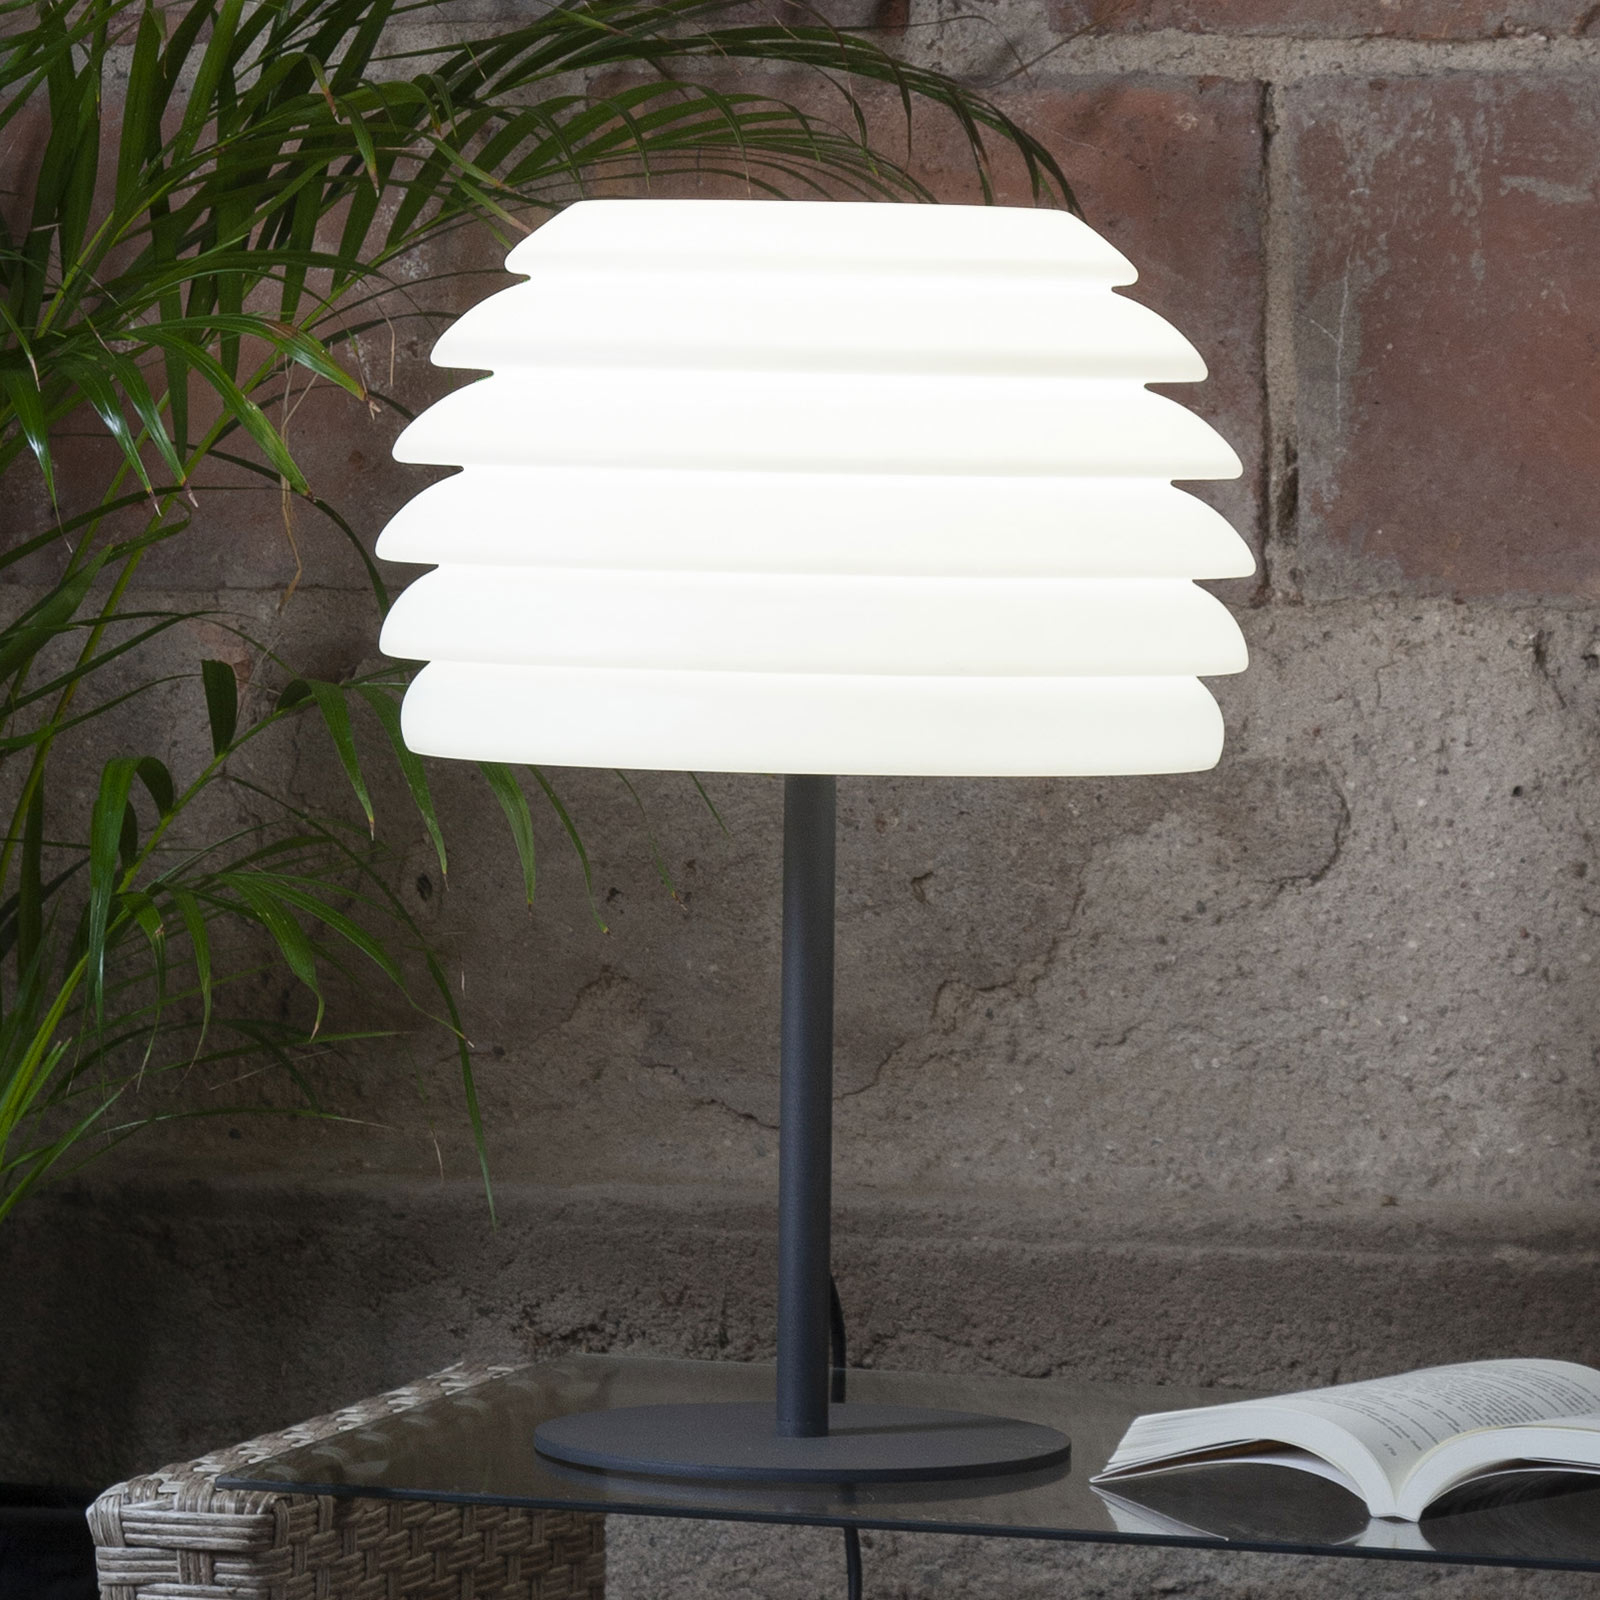 Terassivalo Gardenlight aaltomainen, 50 cm